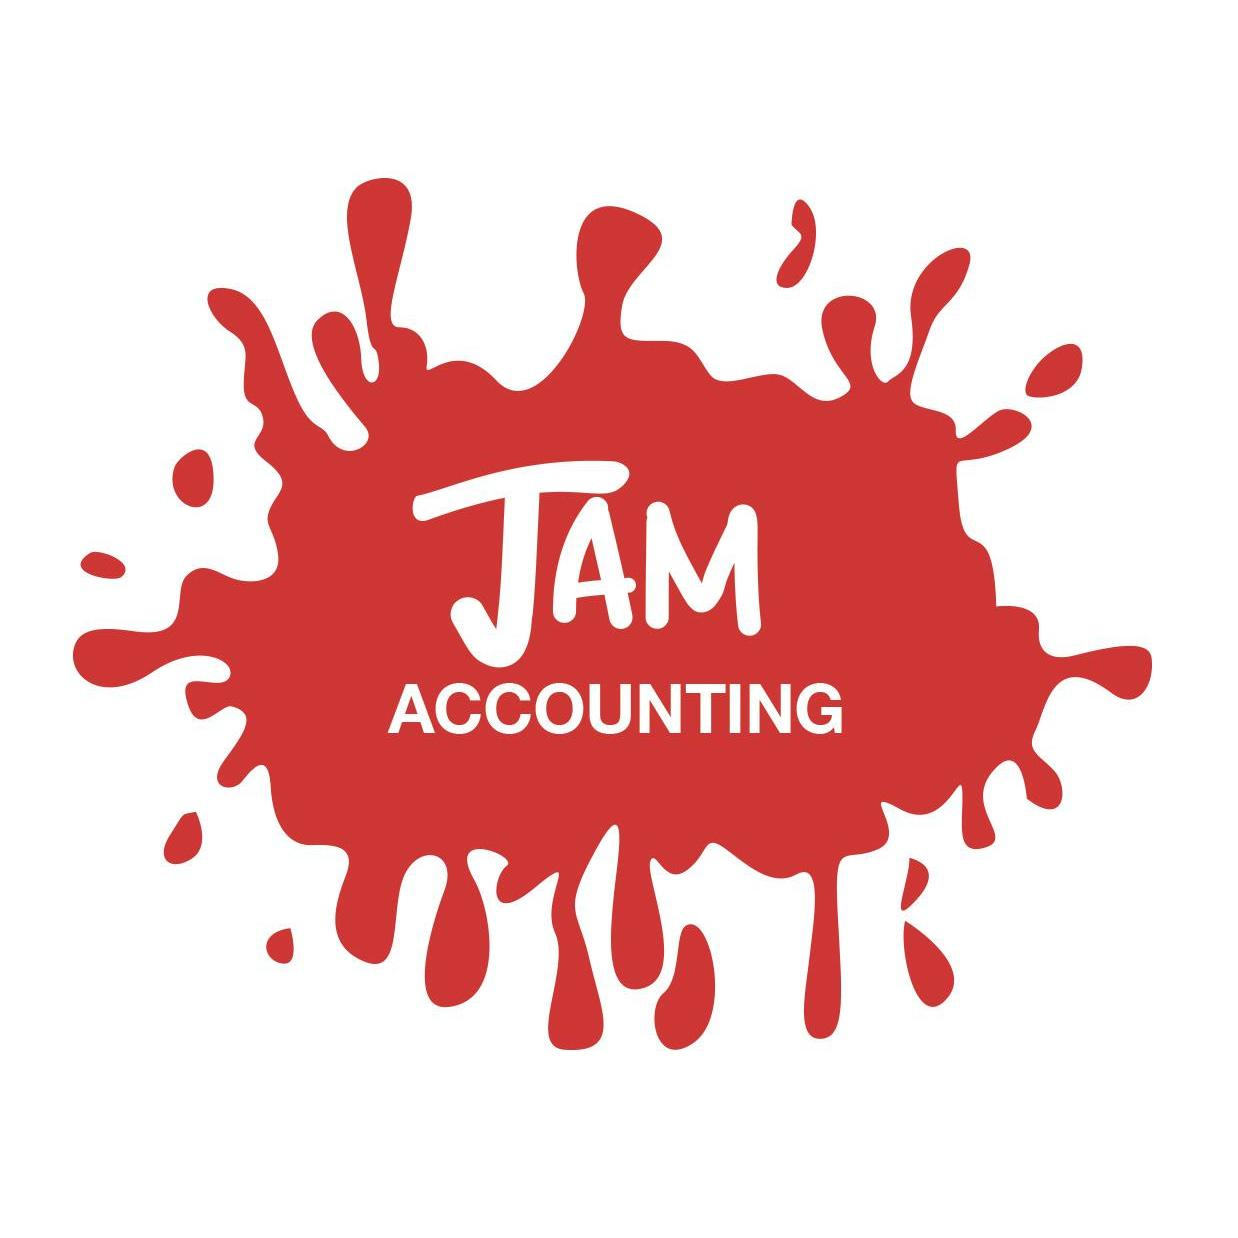 JAM Accounting - Southampton, Hampshire SO31 9BB - 01329 315845 | ShowMeLocal.com